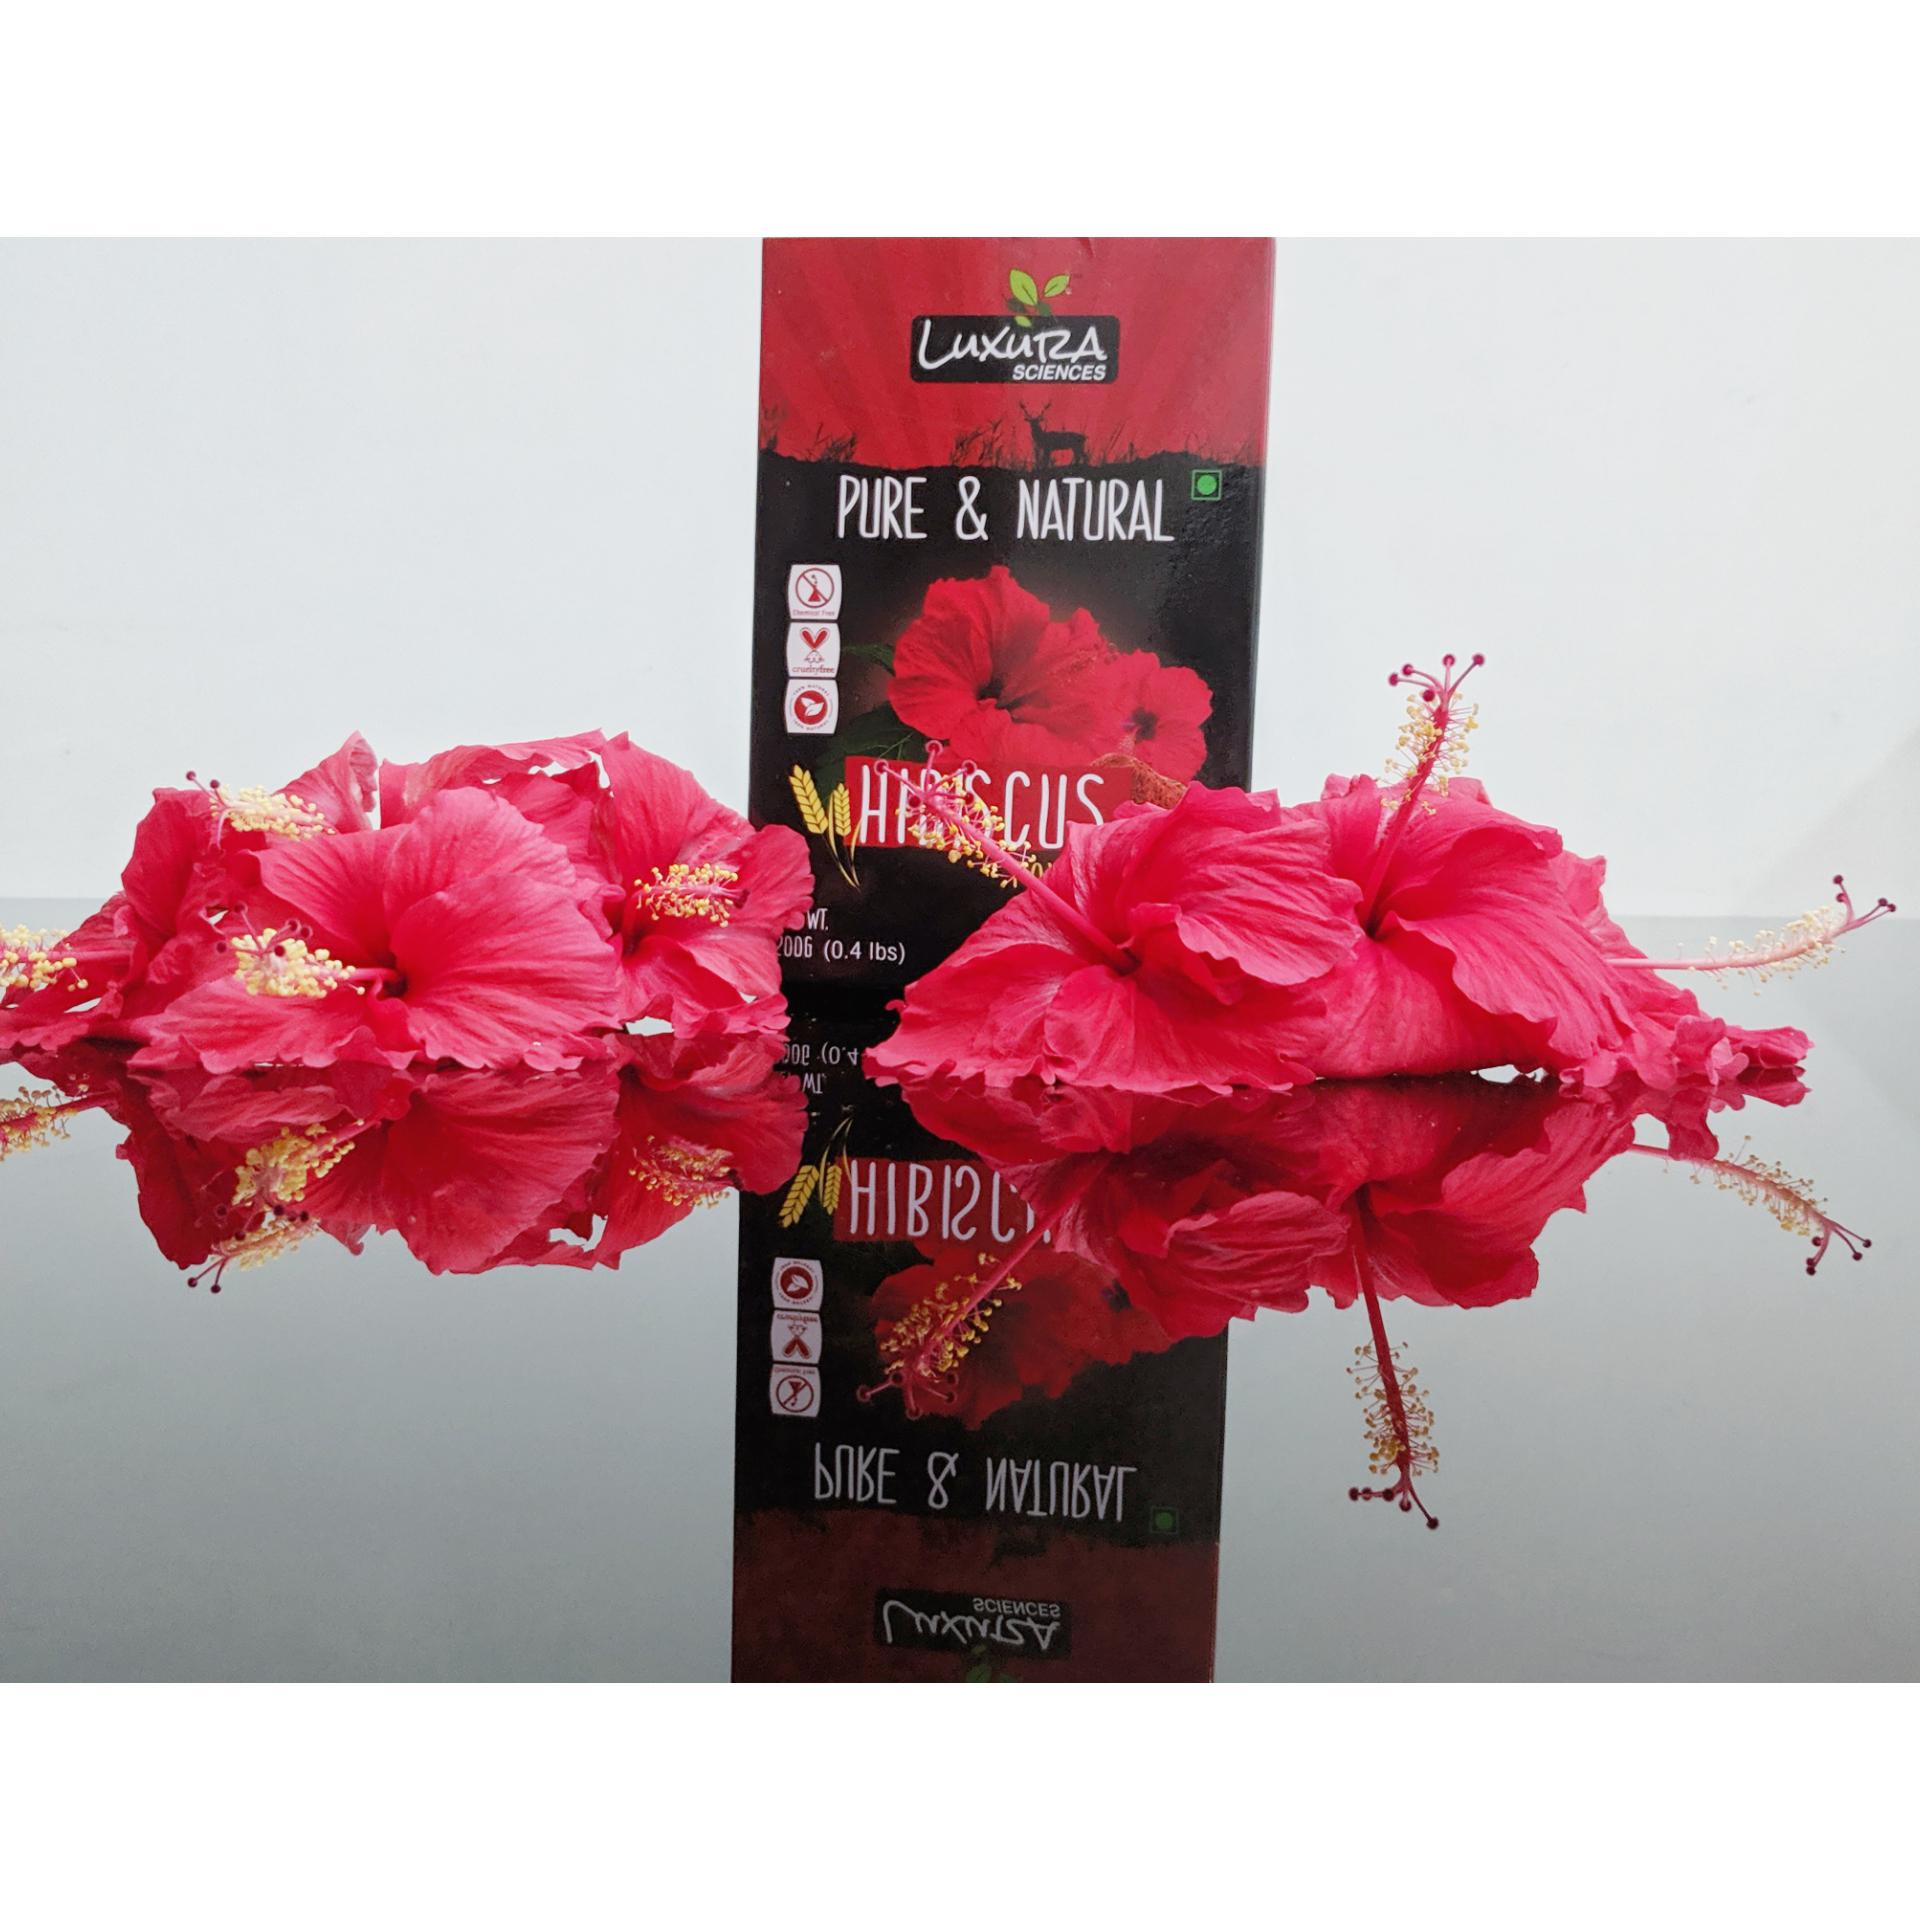 Luxura Sciences Hibiscus Powder 200 Gms -Hibiscus powder-By taniyajoshi13